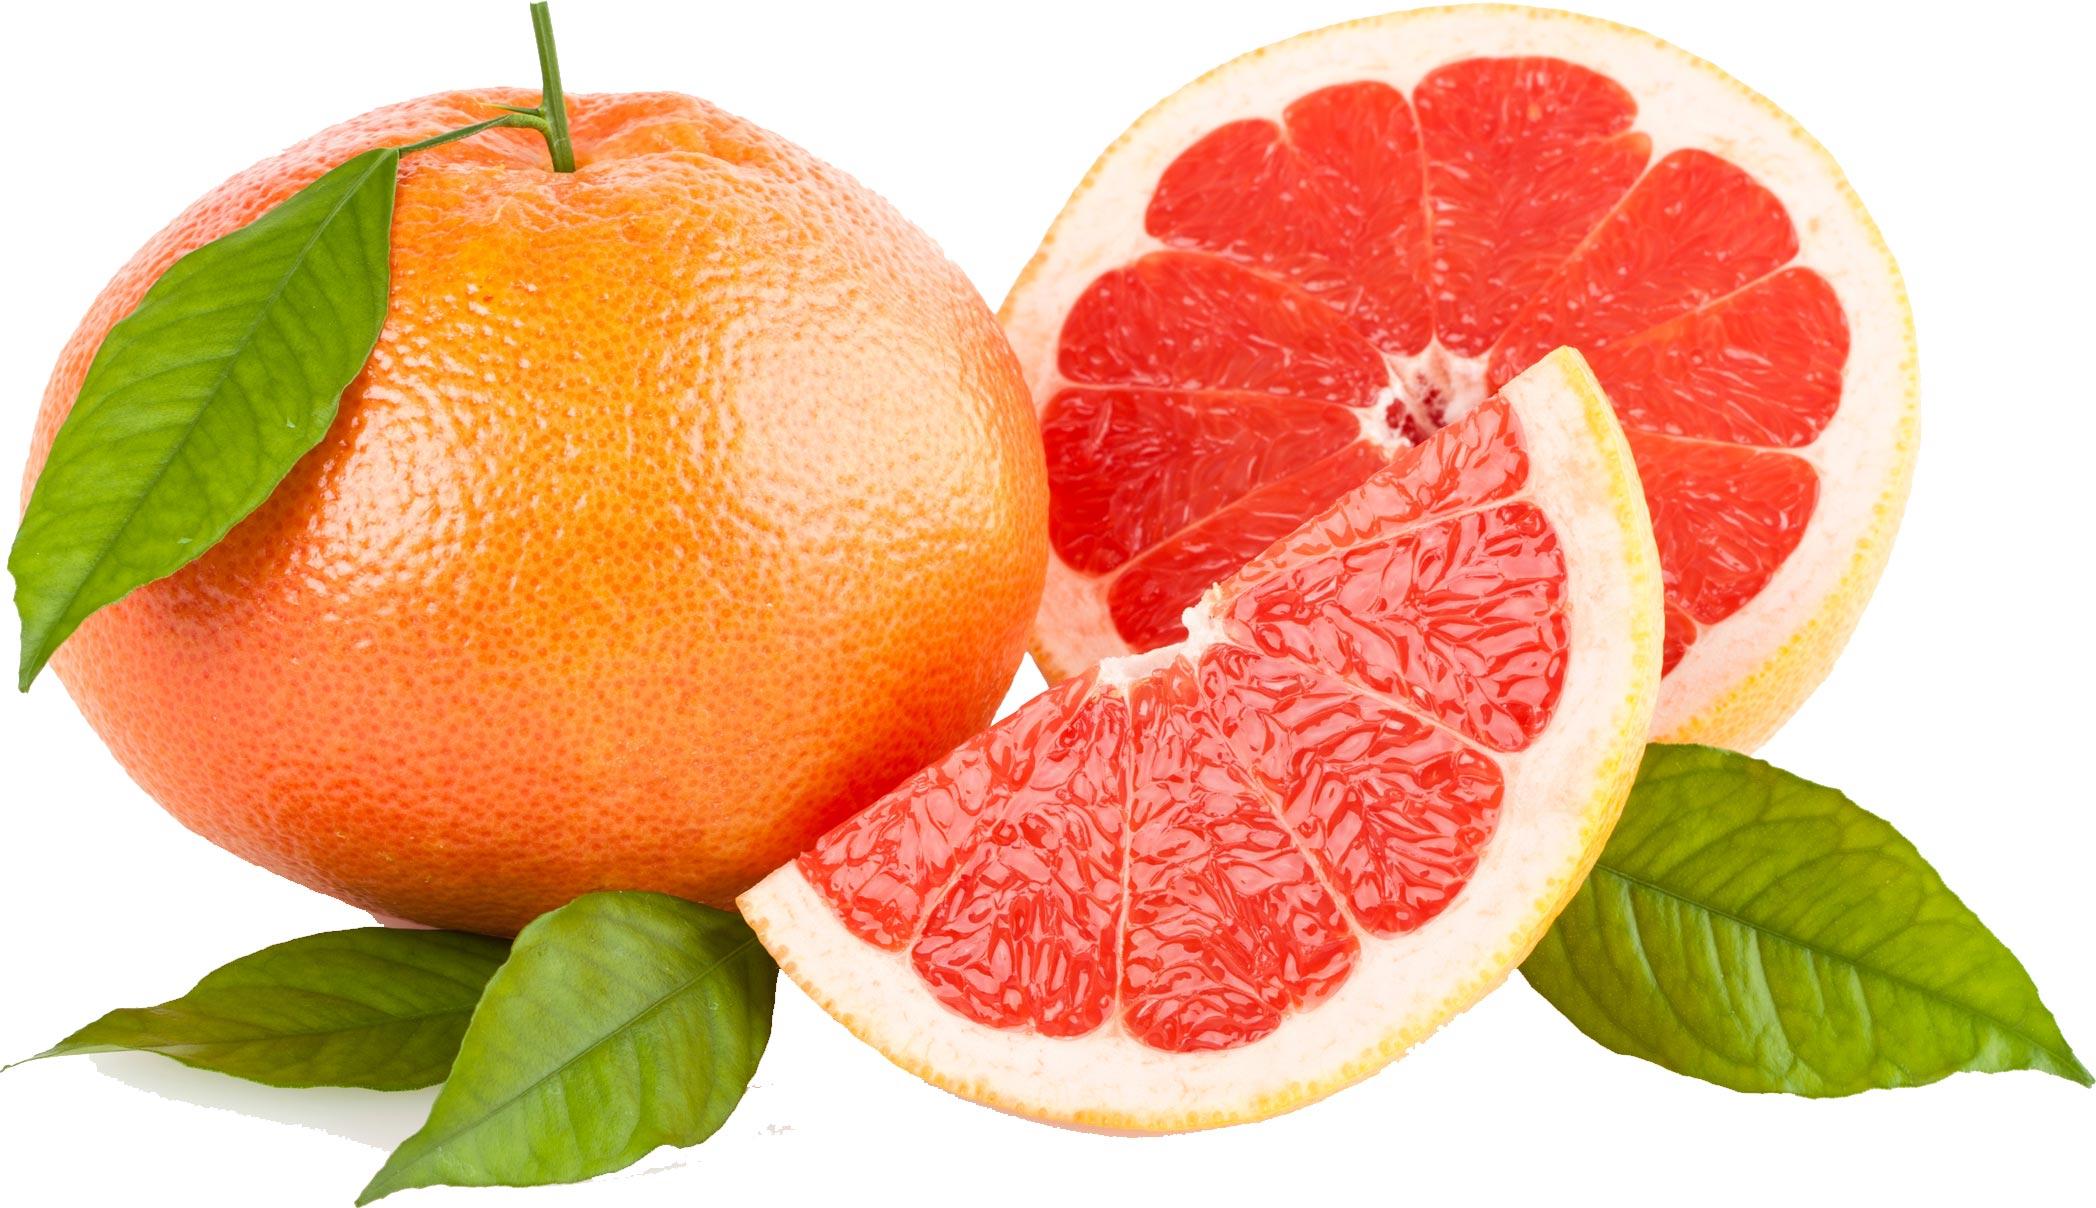 Les graines de pamplemousse pour traiter les infections urinaires - Grapefruit seeds to treat urinary tract infections